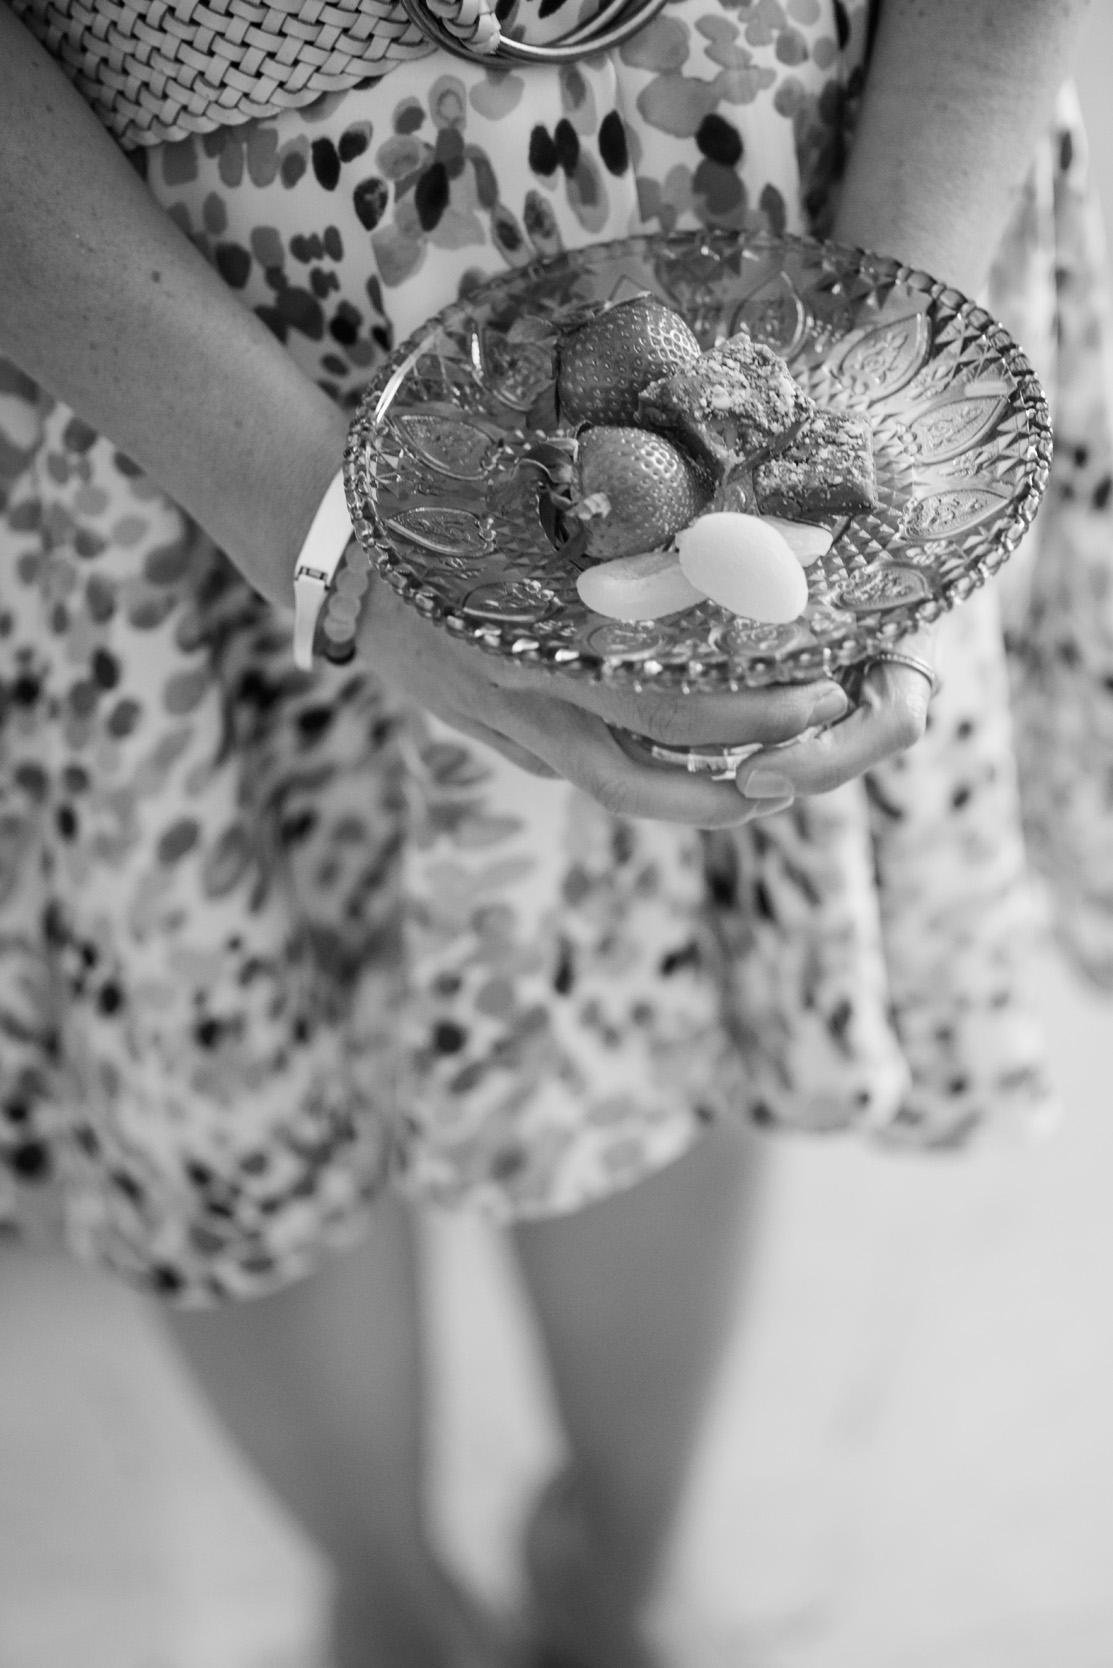 Britt_Nemeth_Studios_PhotographyA_Day_In_The_Life_Portrait_Series081.jpg